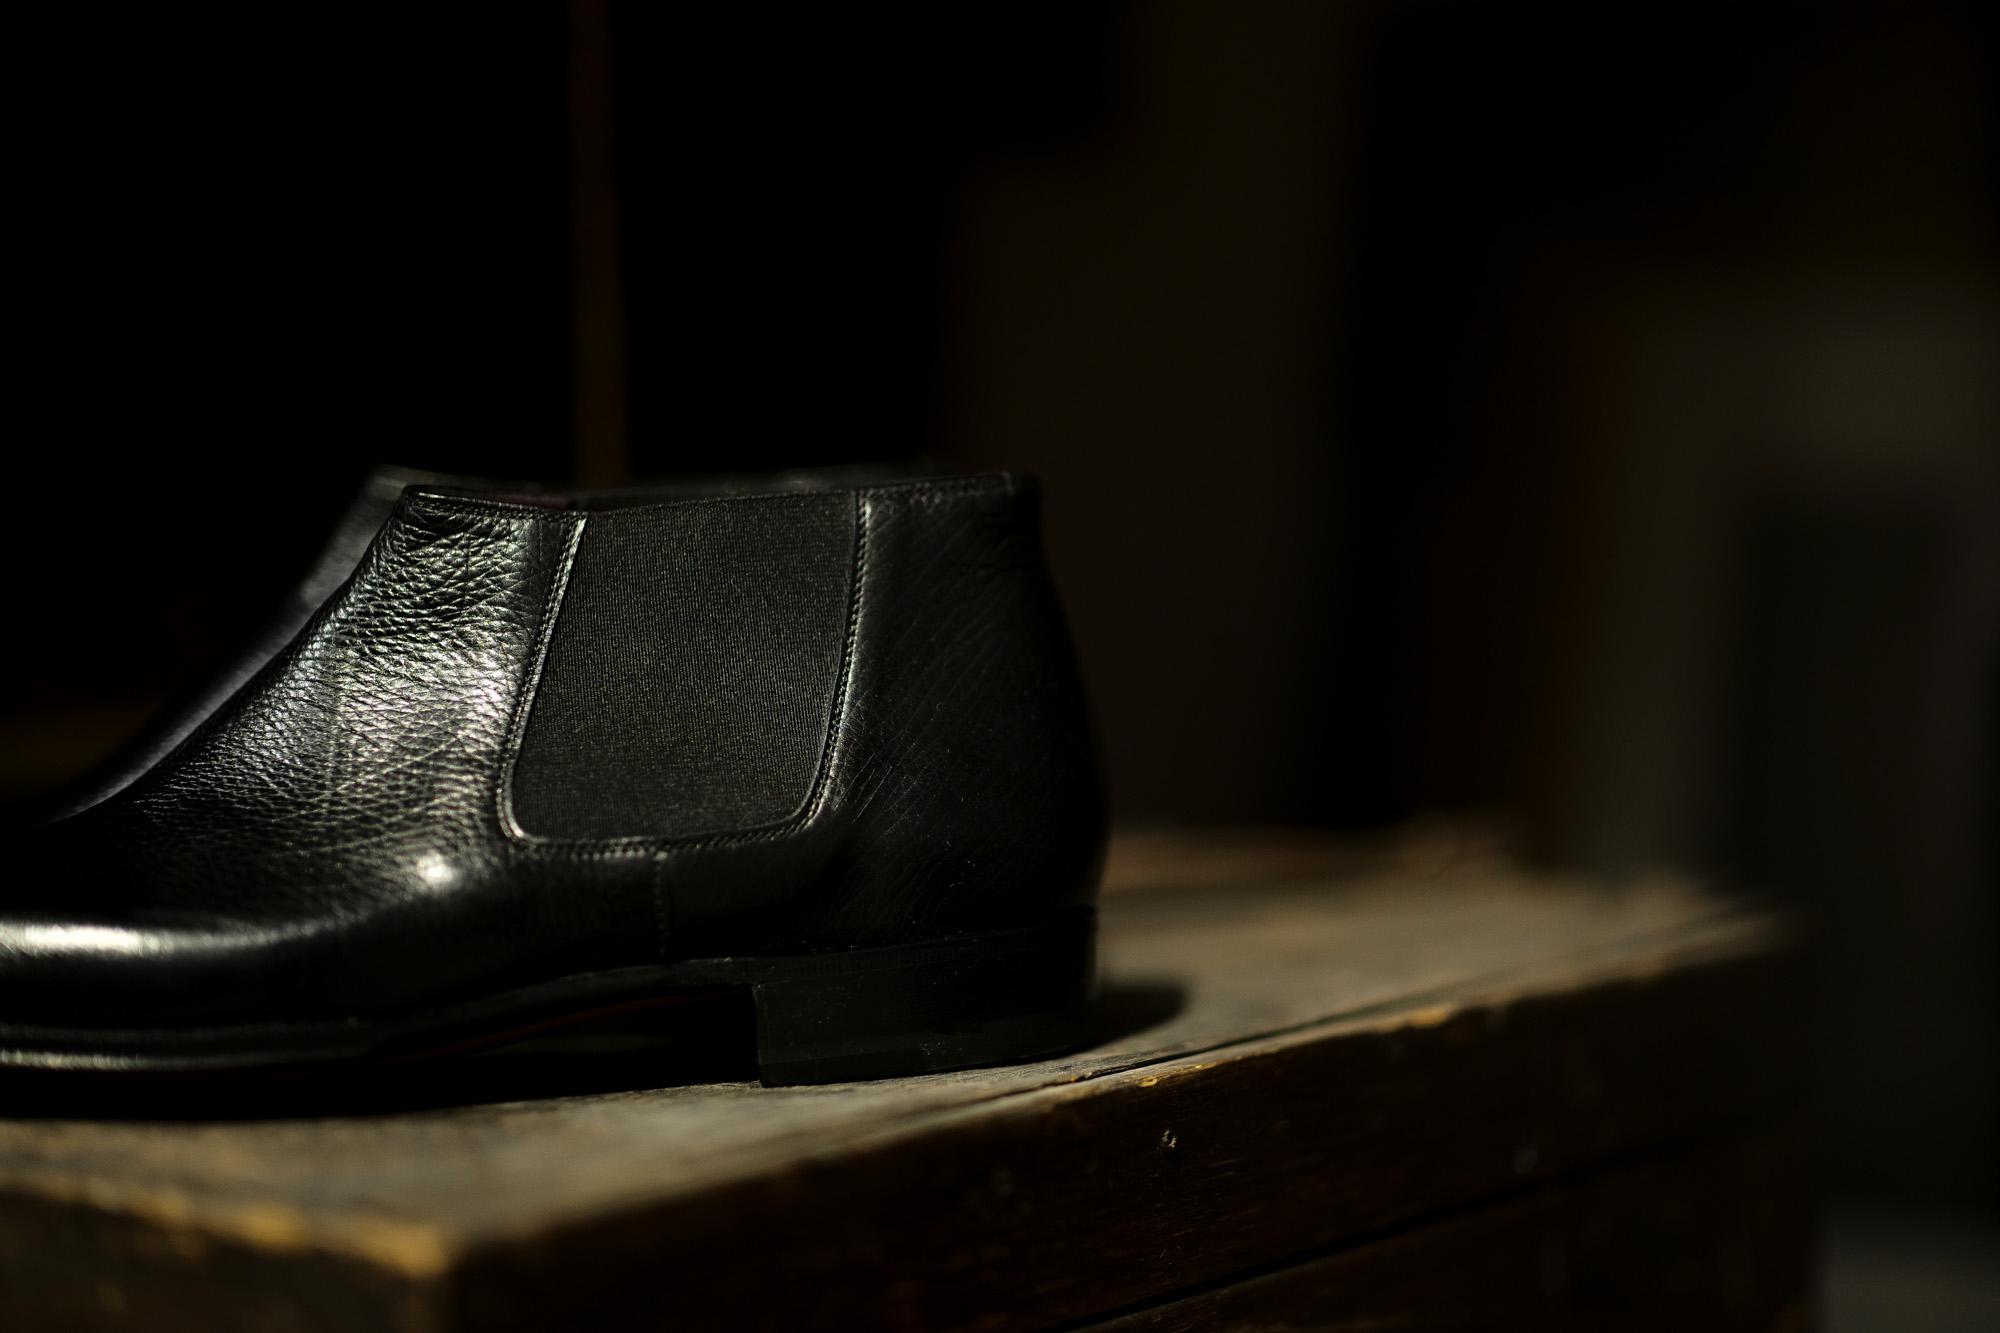 ENZO BONAFE (エンツォボナフェ) CARY GRANT III(ゲーリーグラント3) LAMA LEATHER(ラマレザー) Side gore Boots サイドゴアブーツ NERO(ブラック) made in italy (イタリア製) 2021 愛知 名古屋 Alto e Diritto altoediritto アルトエデリット